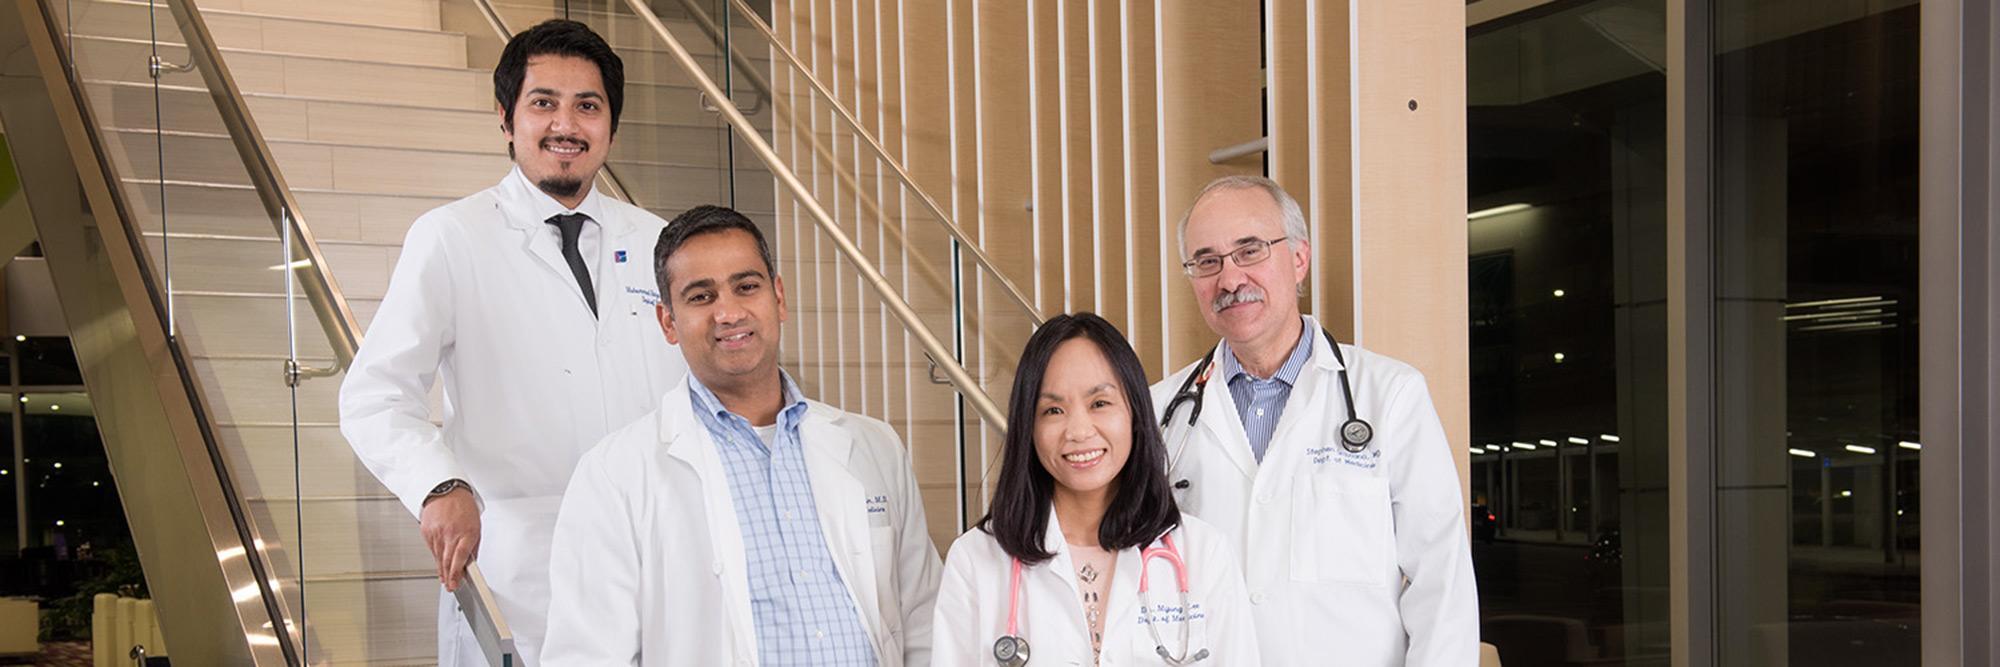 Hematology/Oncology at Oneida   Upstate Cancer Center  SUNY Upstate